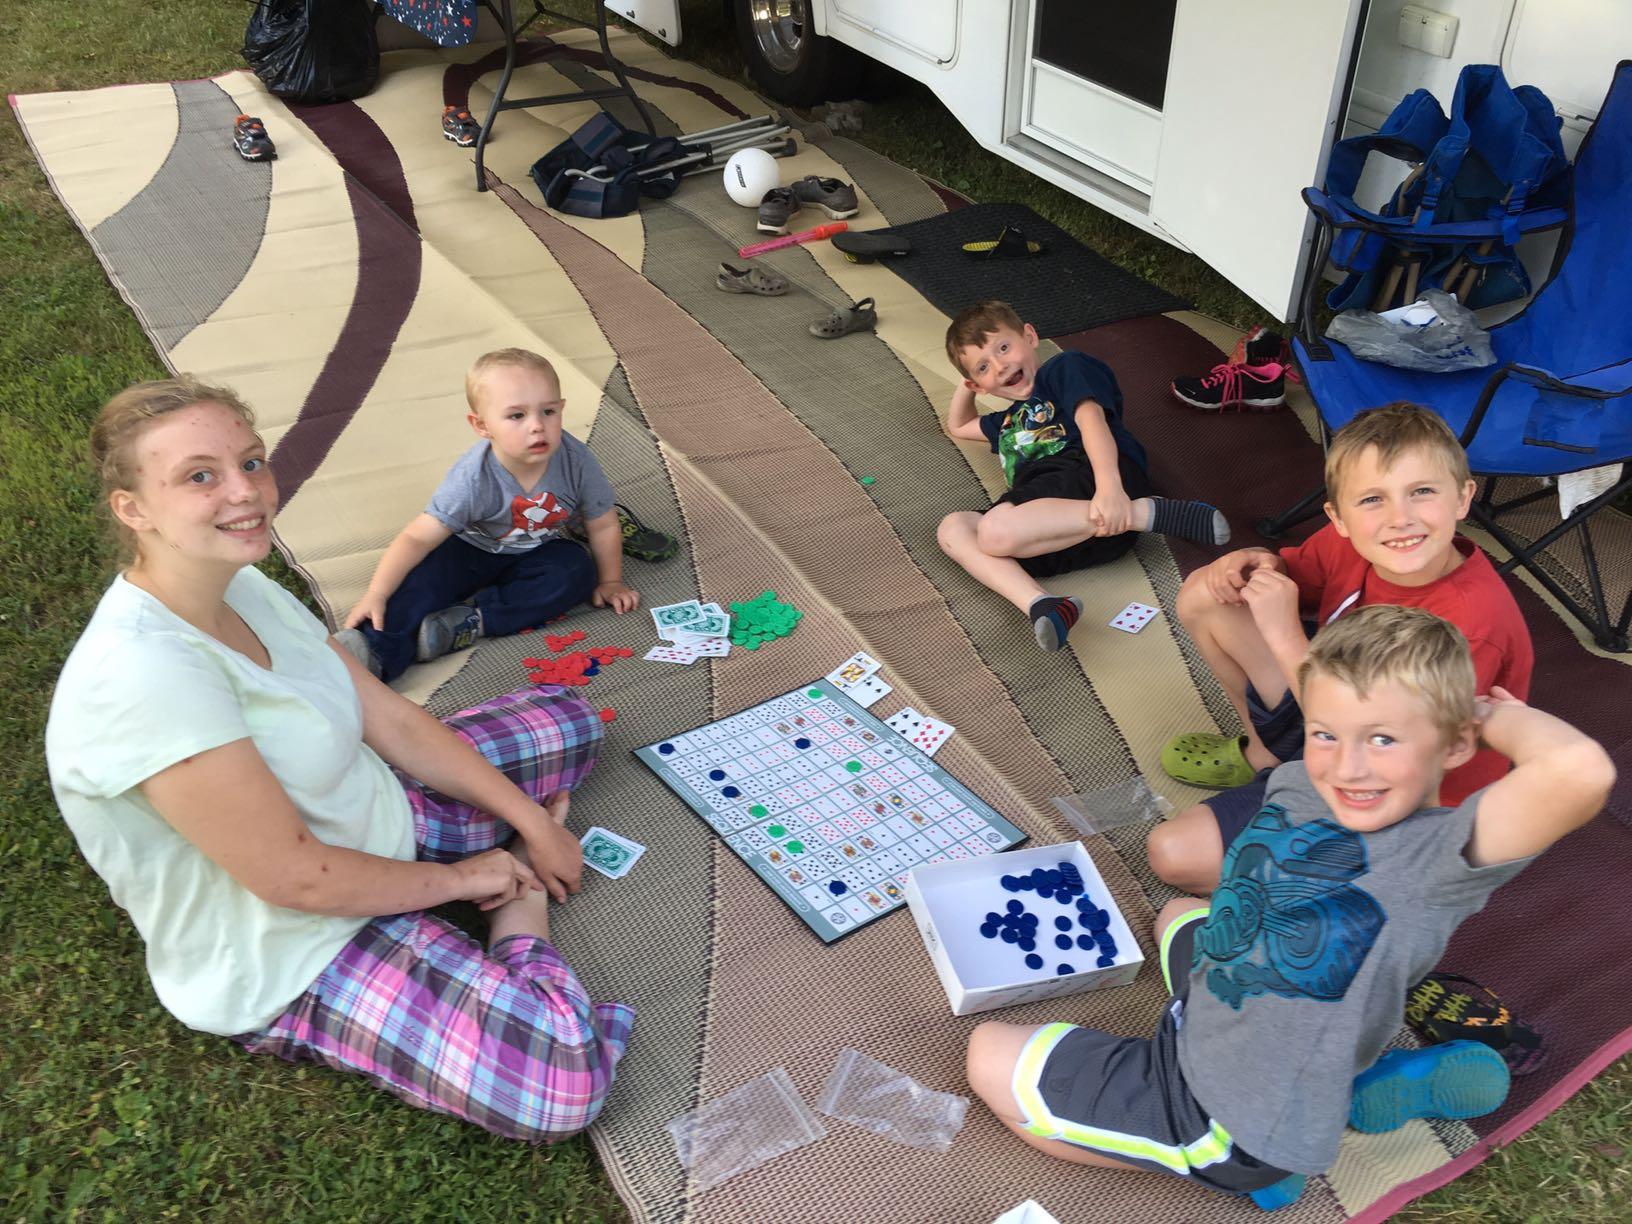 http://wnyrvrental.com/wp-content/uploads/2016/07/camping-3.jpg